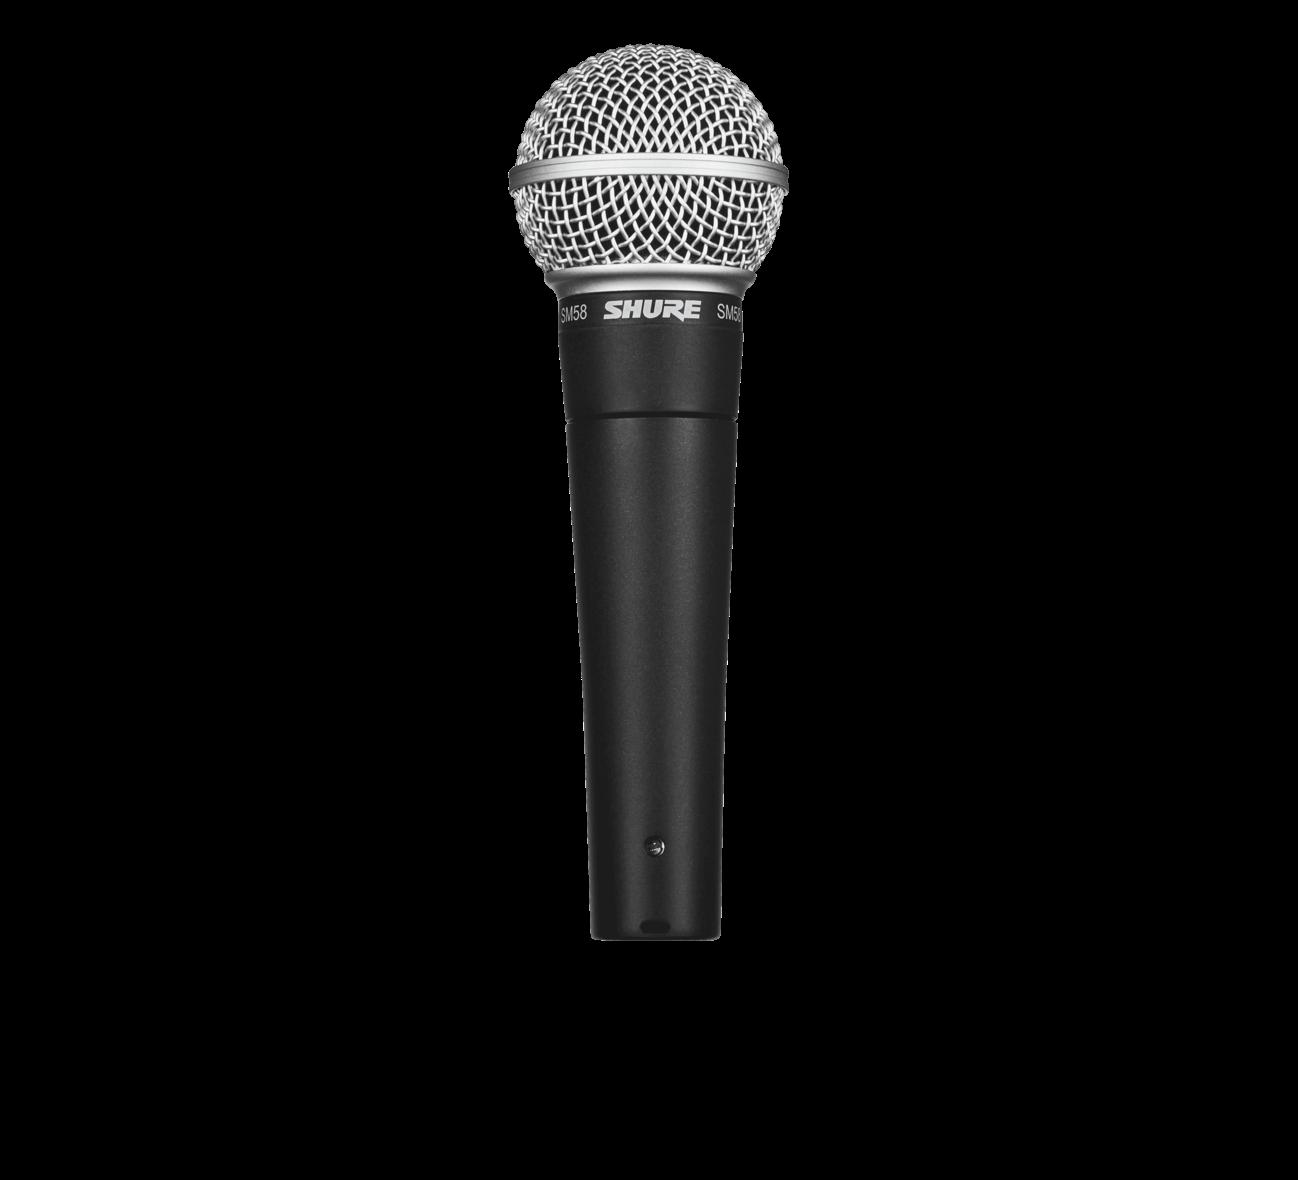 Shure SM58-LC Handheld Microphone